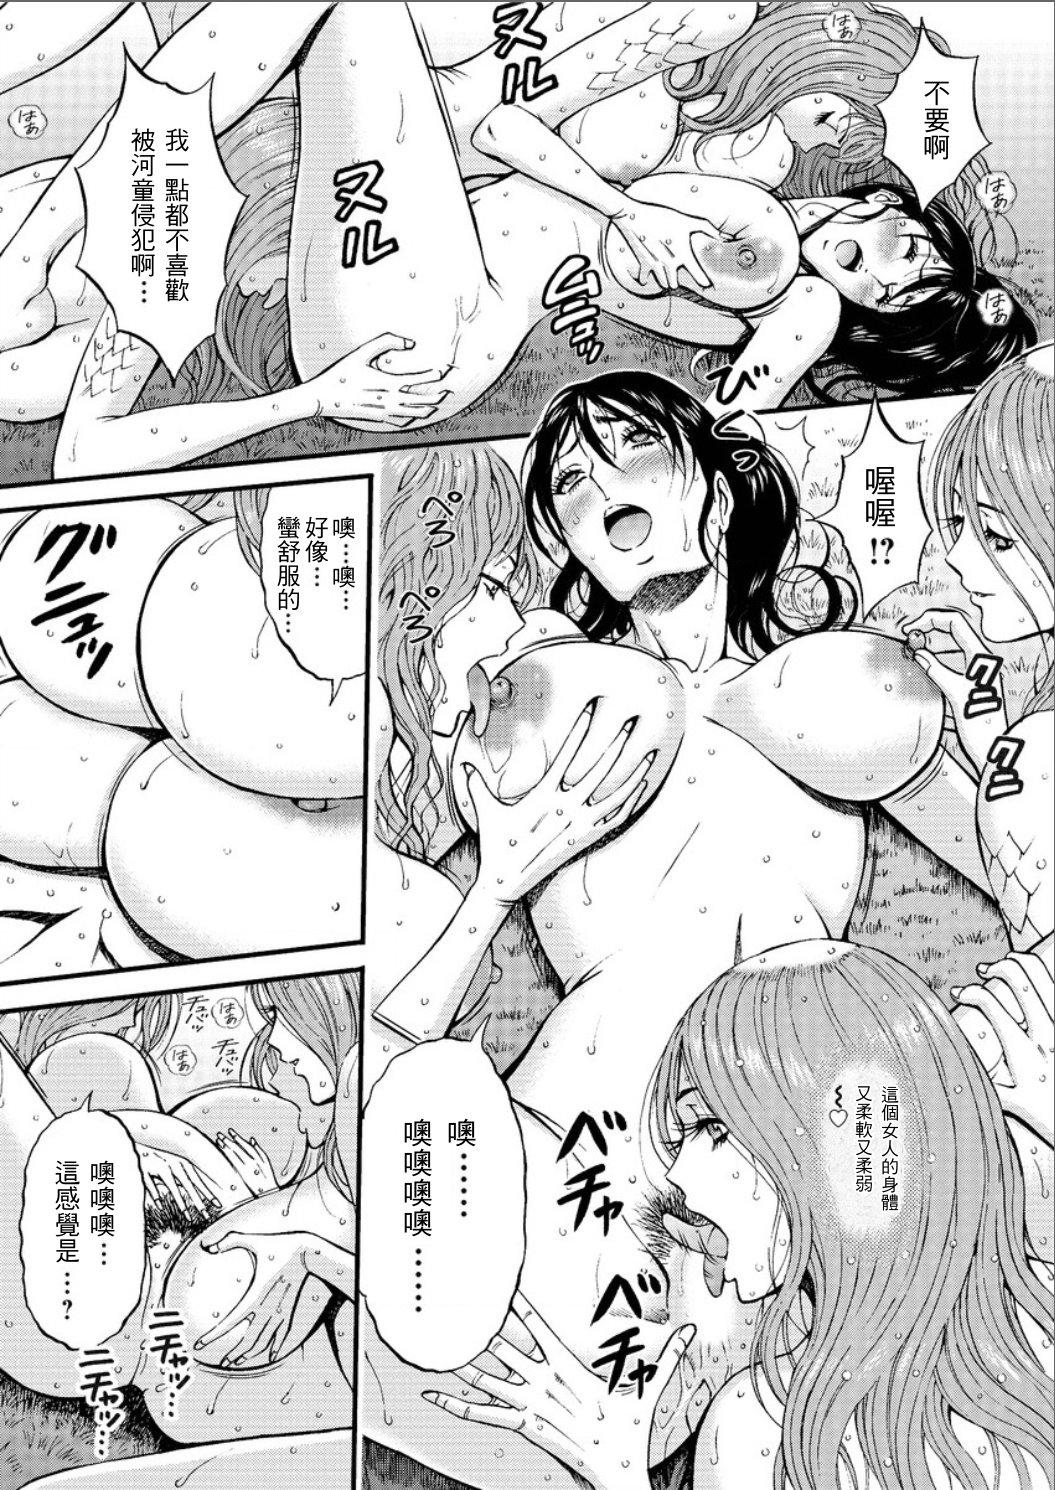 Kigenzen 10000 Nen no Ota | 史前一萬年的宅男 Ch. 19-24 31